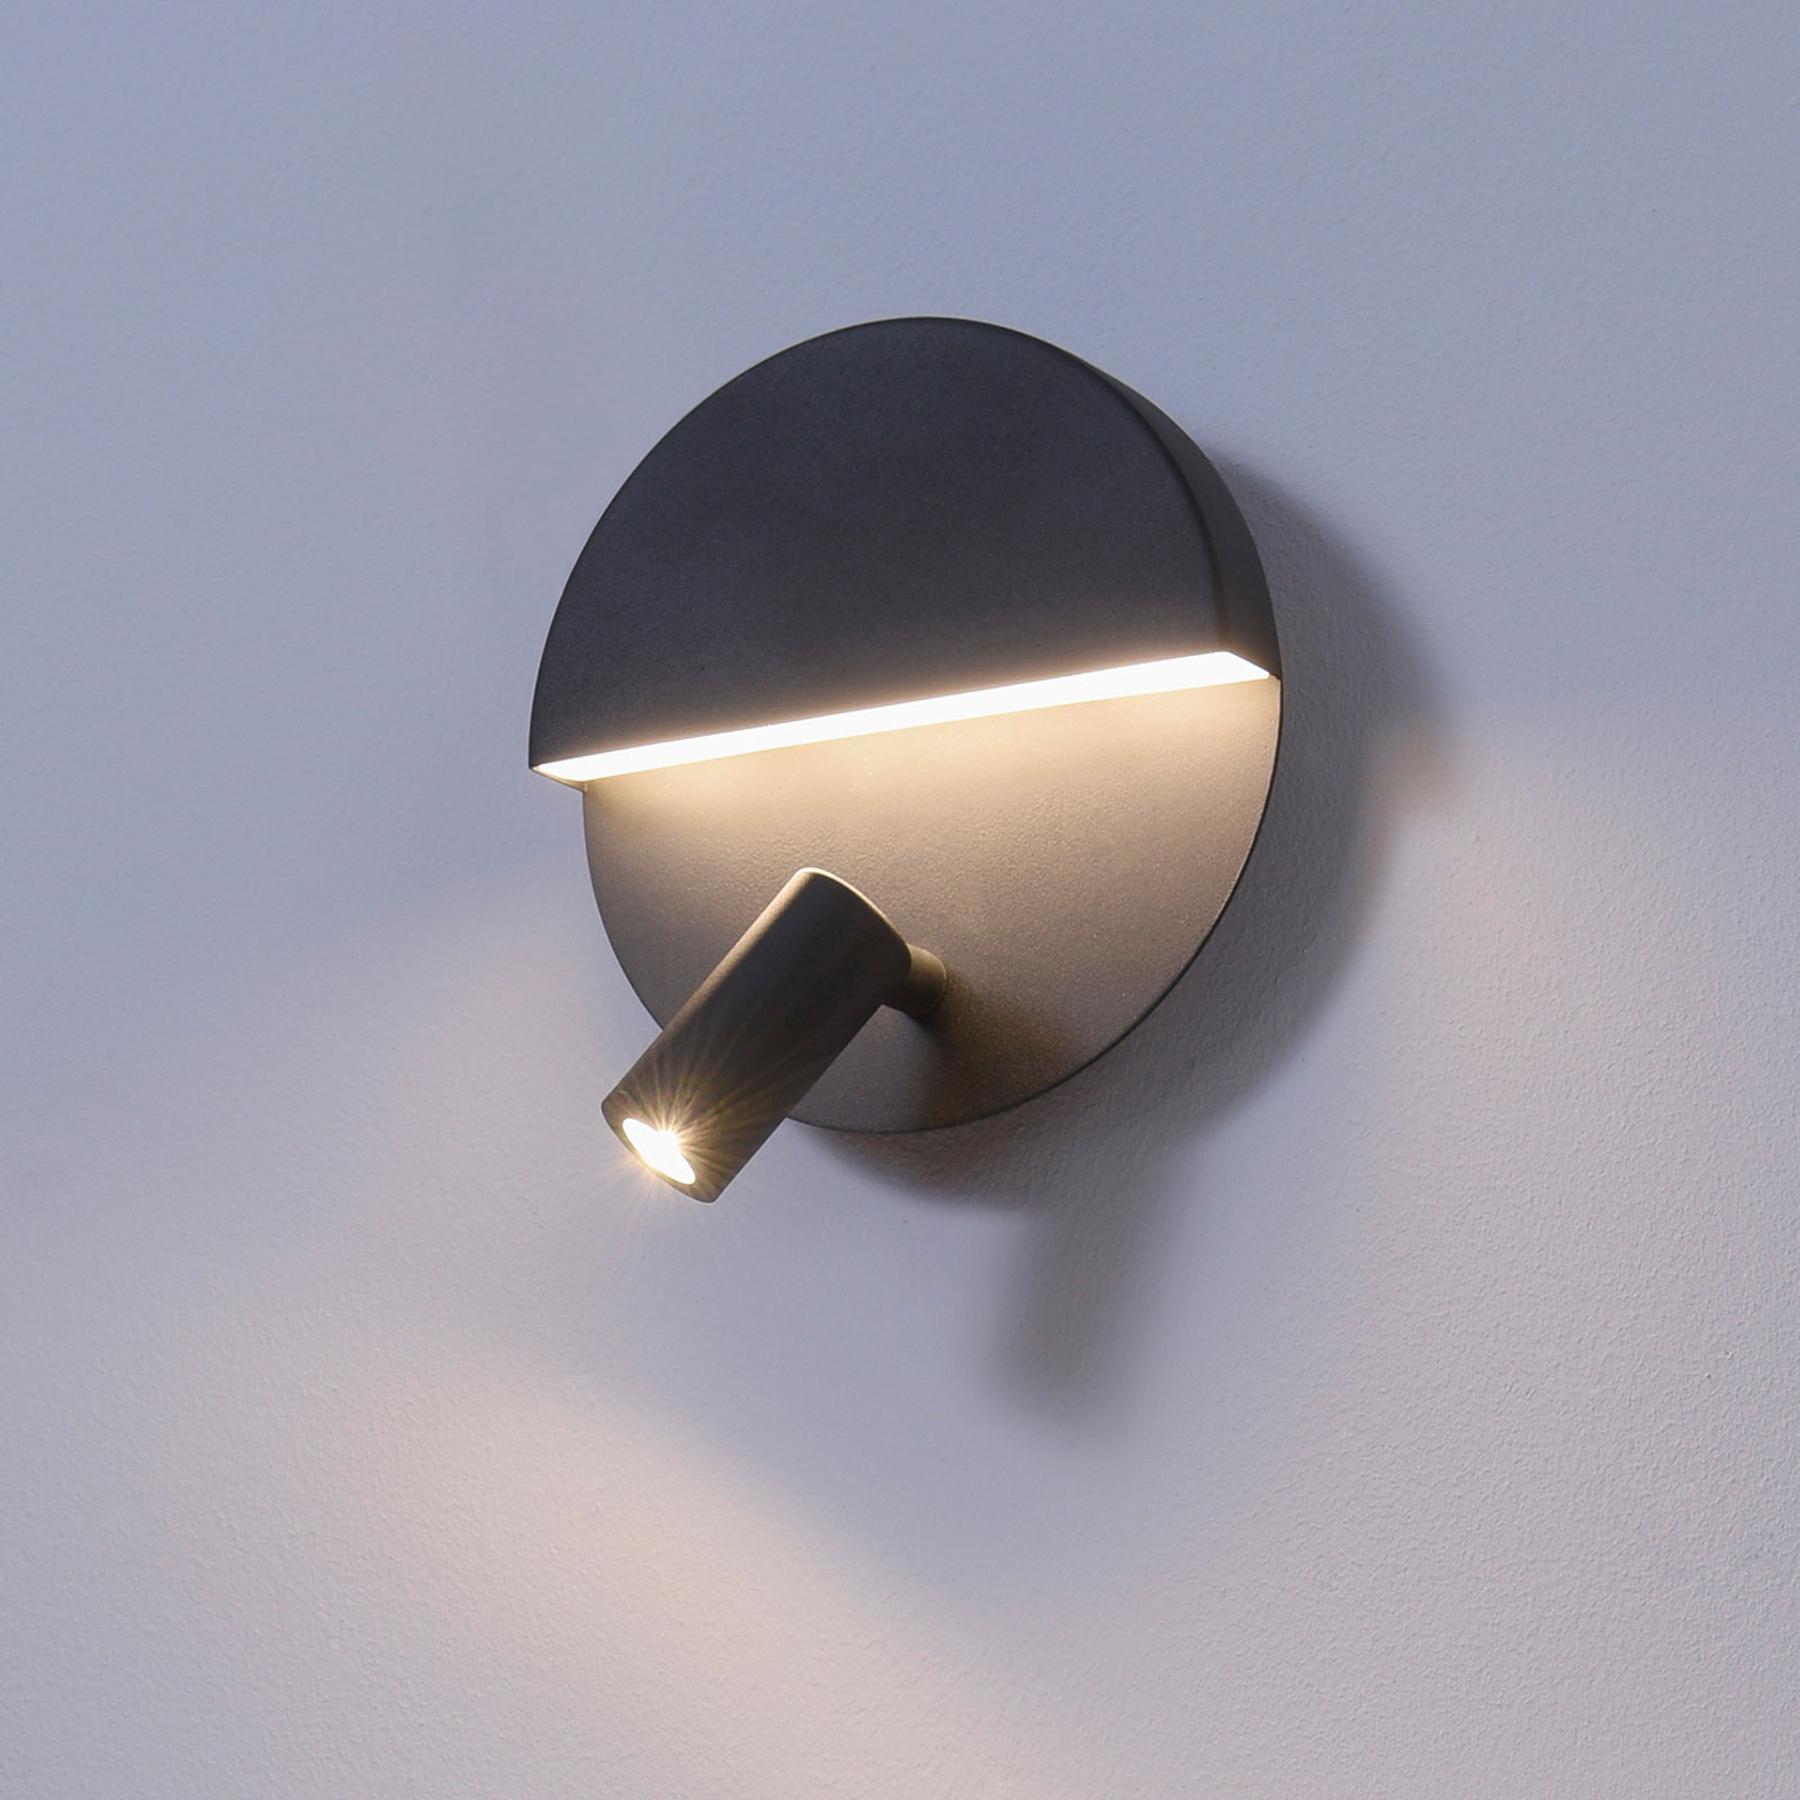 LED wandlamp Mario met zwenkbare spot